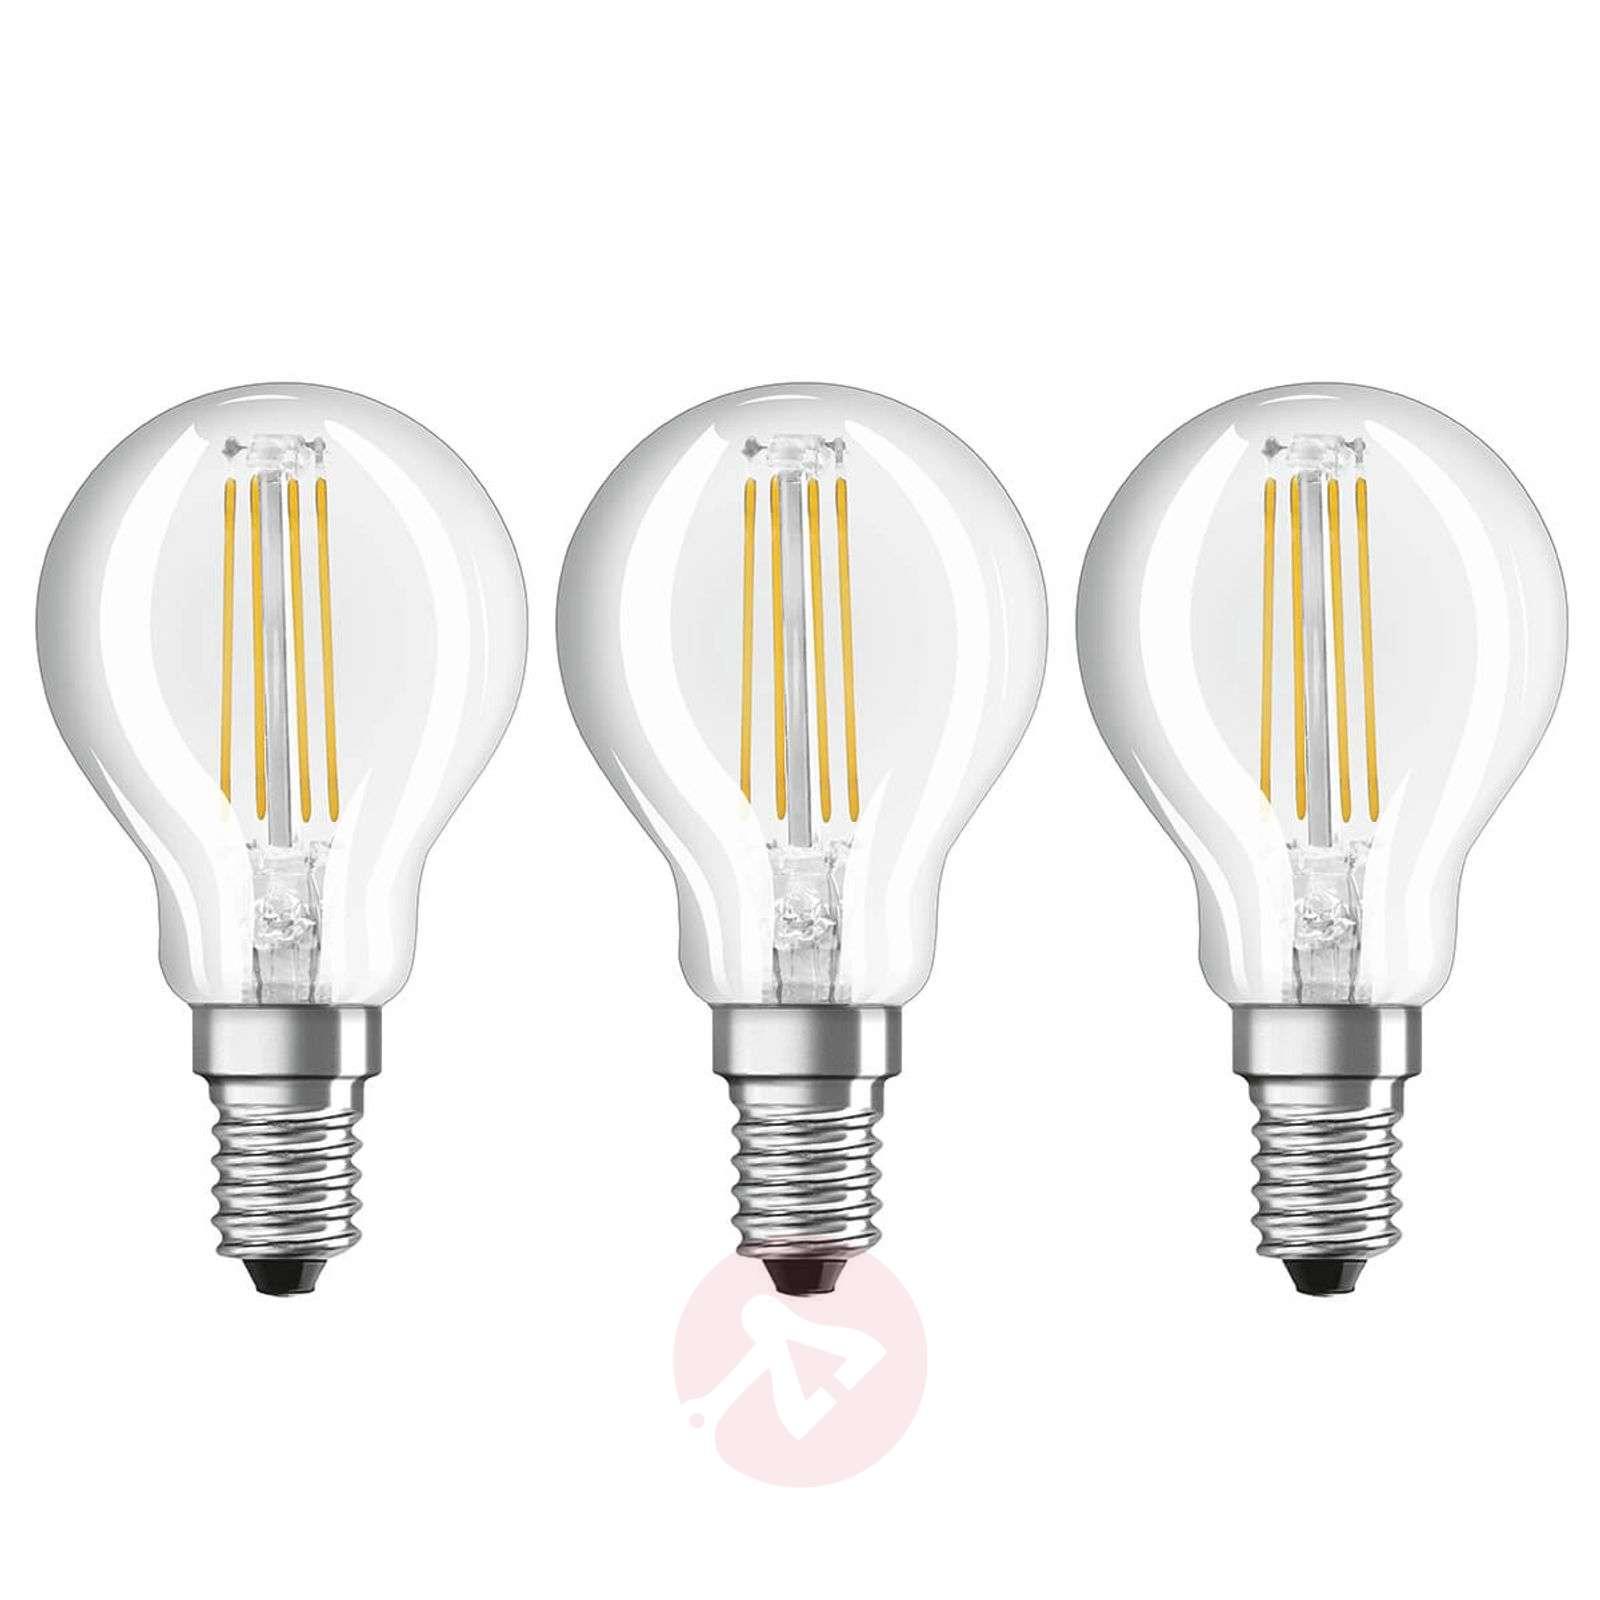 LED filament bulb E14 4,5 W warm white, set of 3-7262099-01